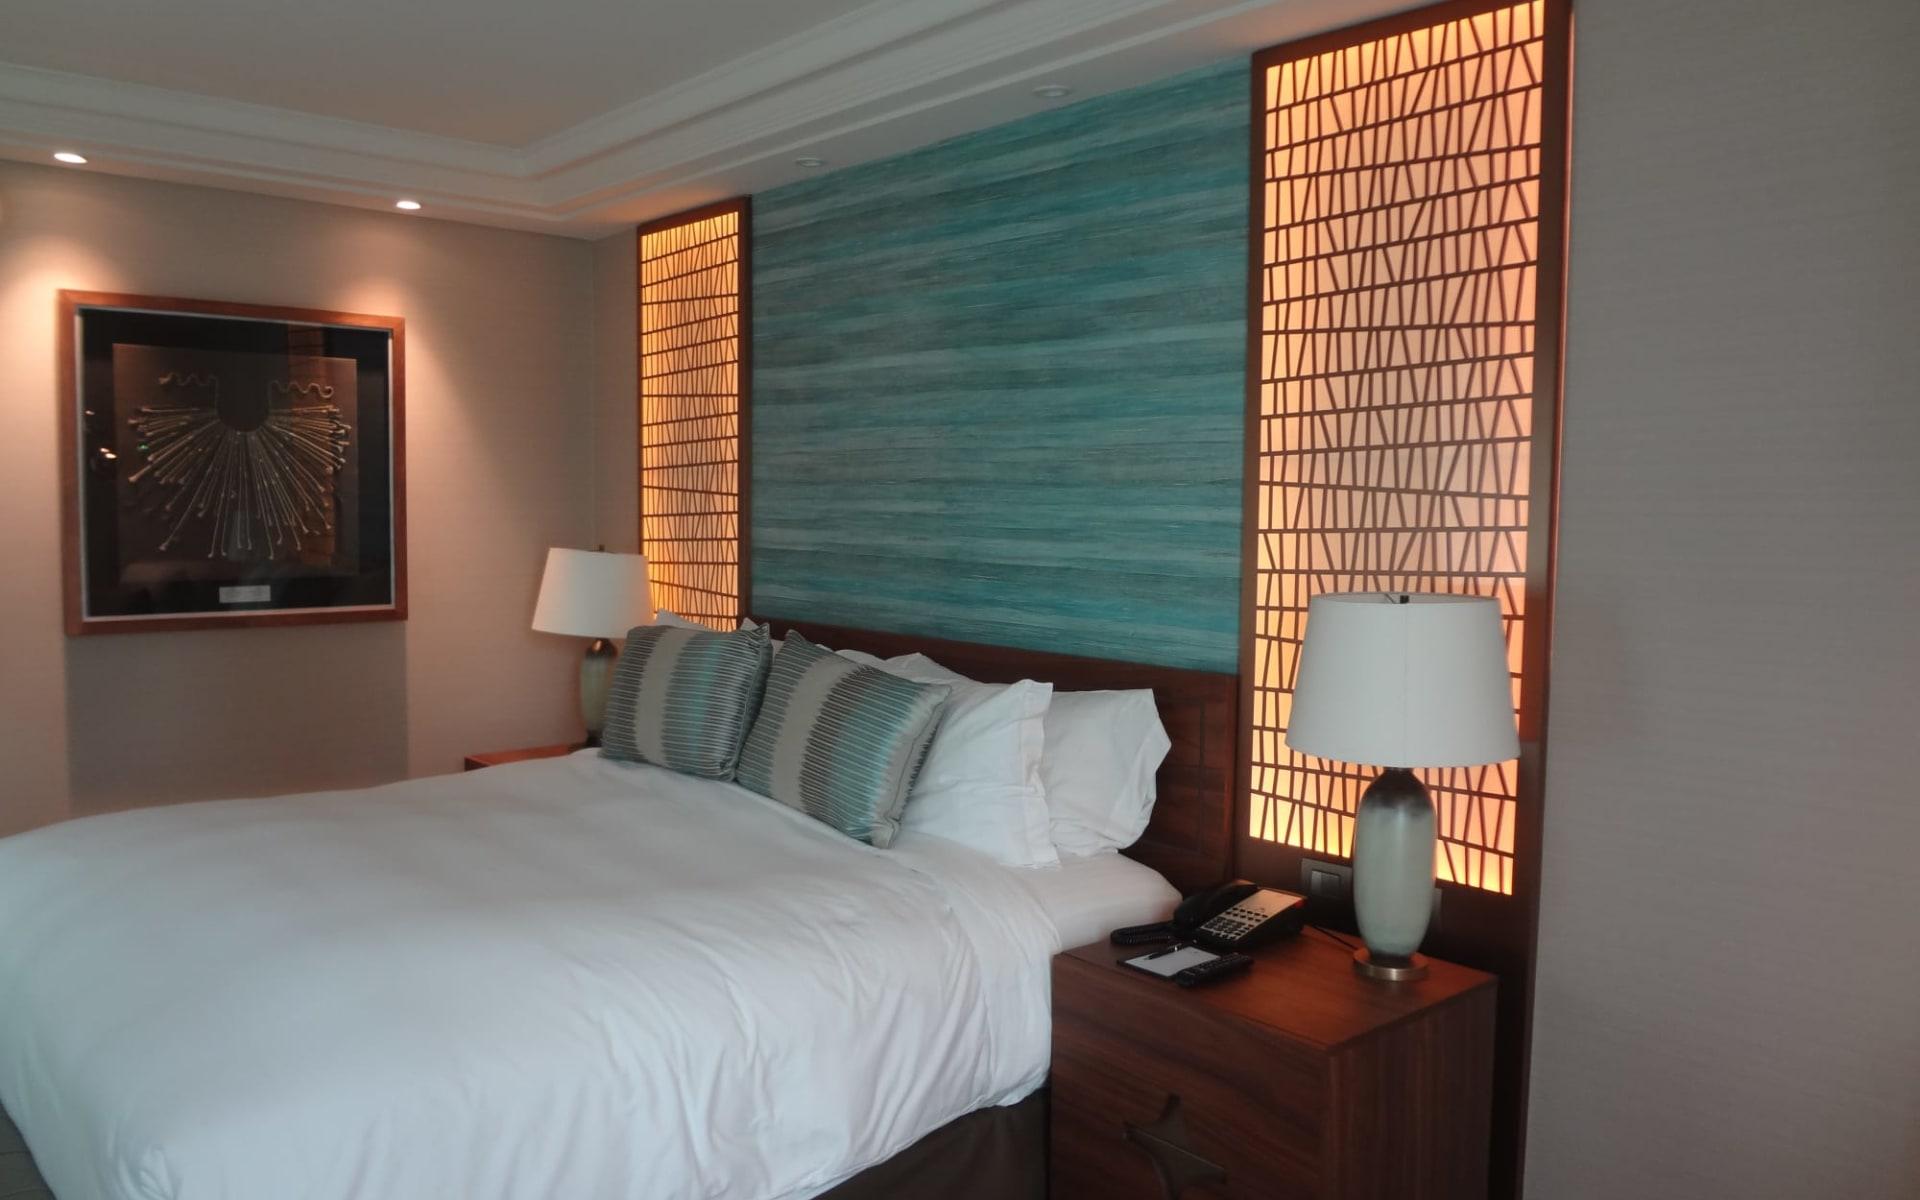 Hotel Ritz Carlton in Santiago de Chile: SCL_Ritz Carlton_Deluxe Room_Room